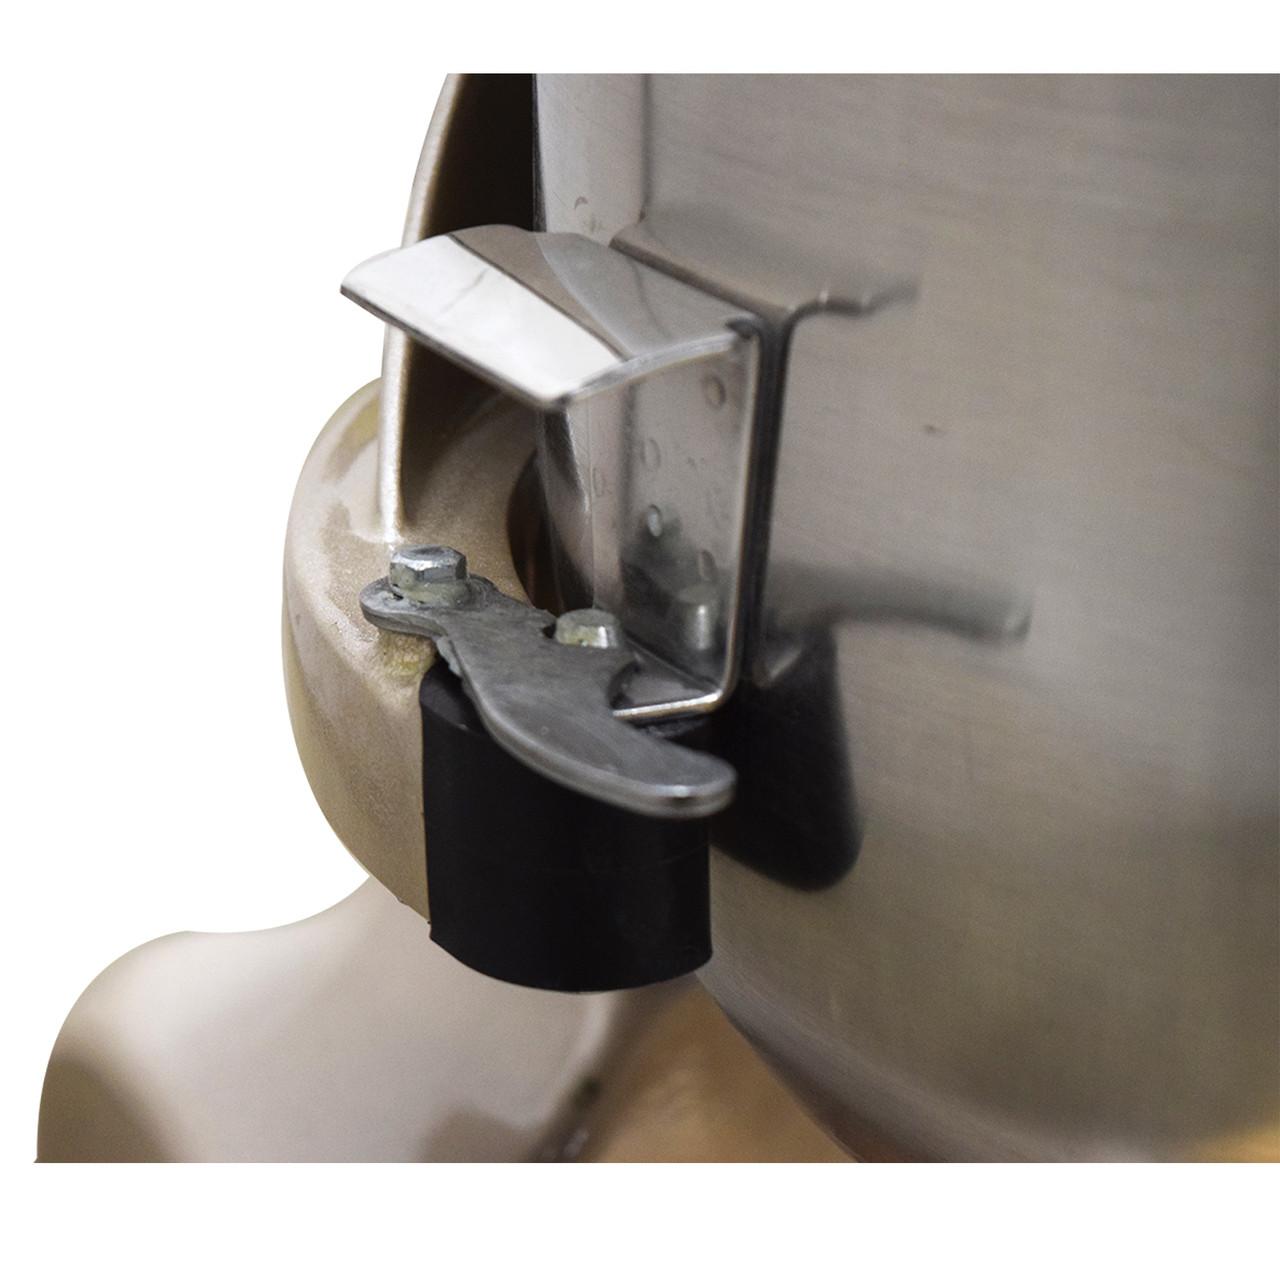 AE-20GA 20 Quart Commercial Planetary Mixer Bowl Left Arm Detail And Bowl Lock